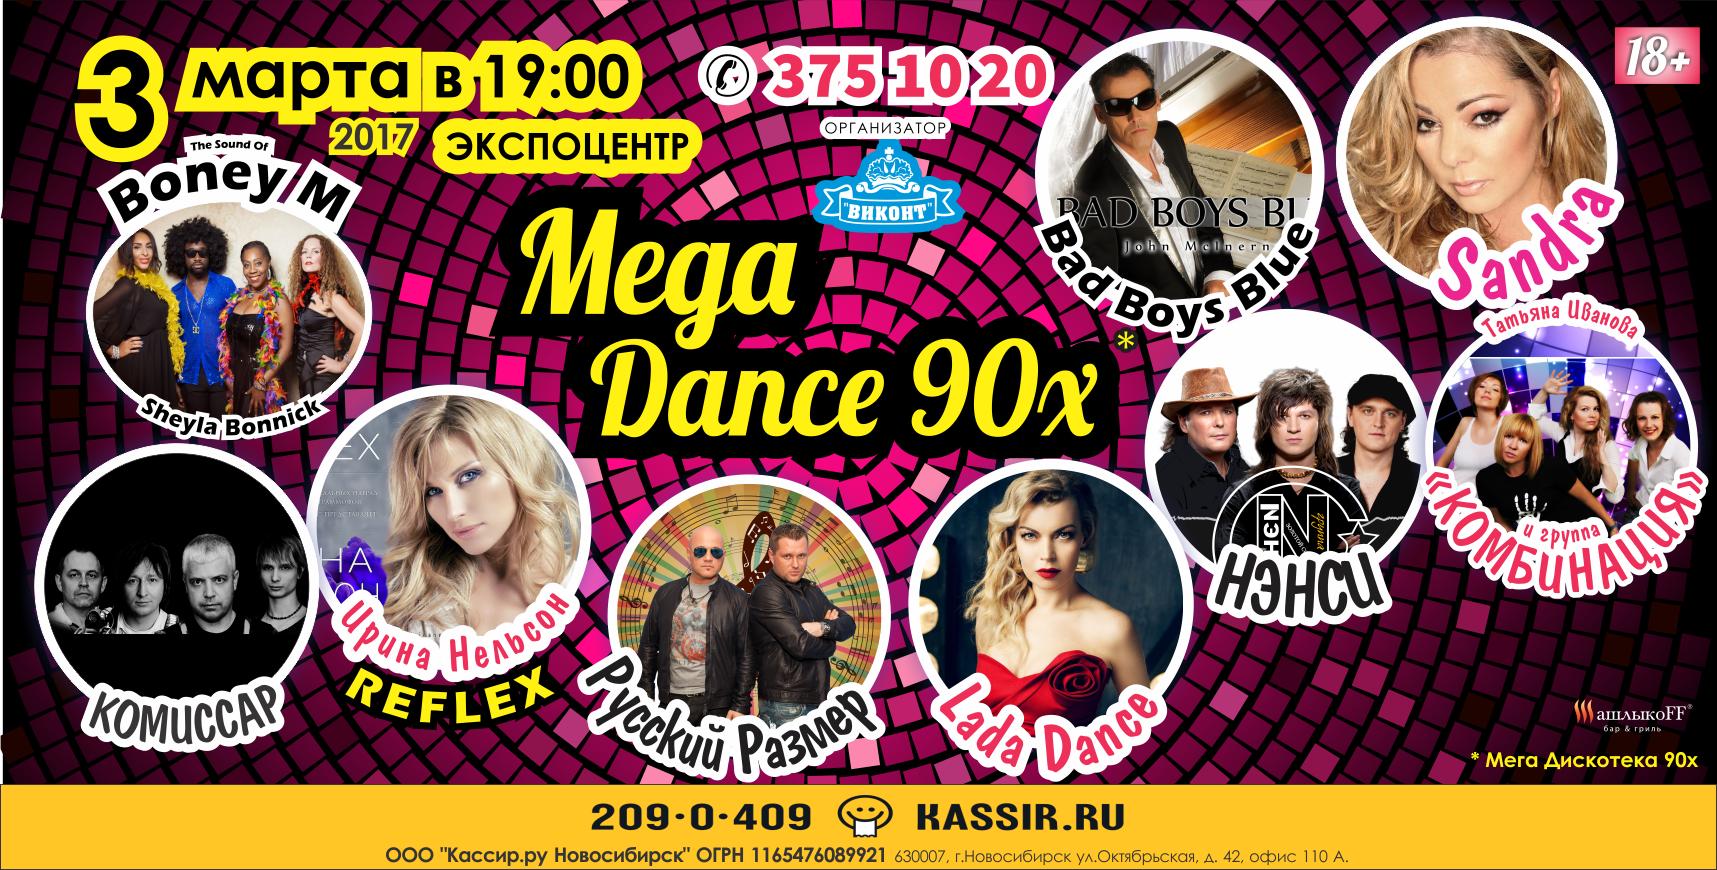 Mega Dance 90-ых vikont54.com